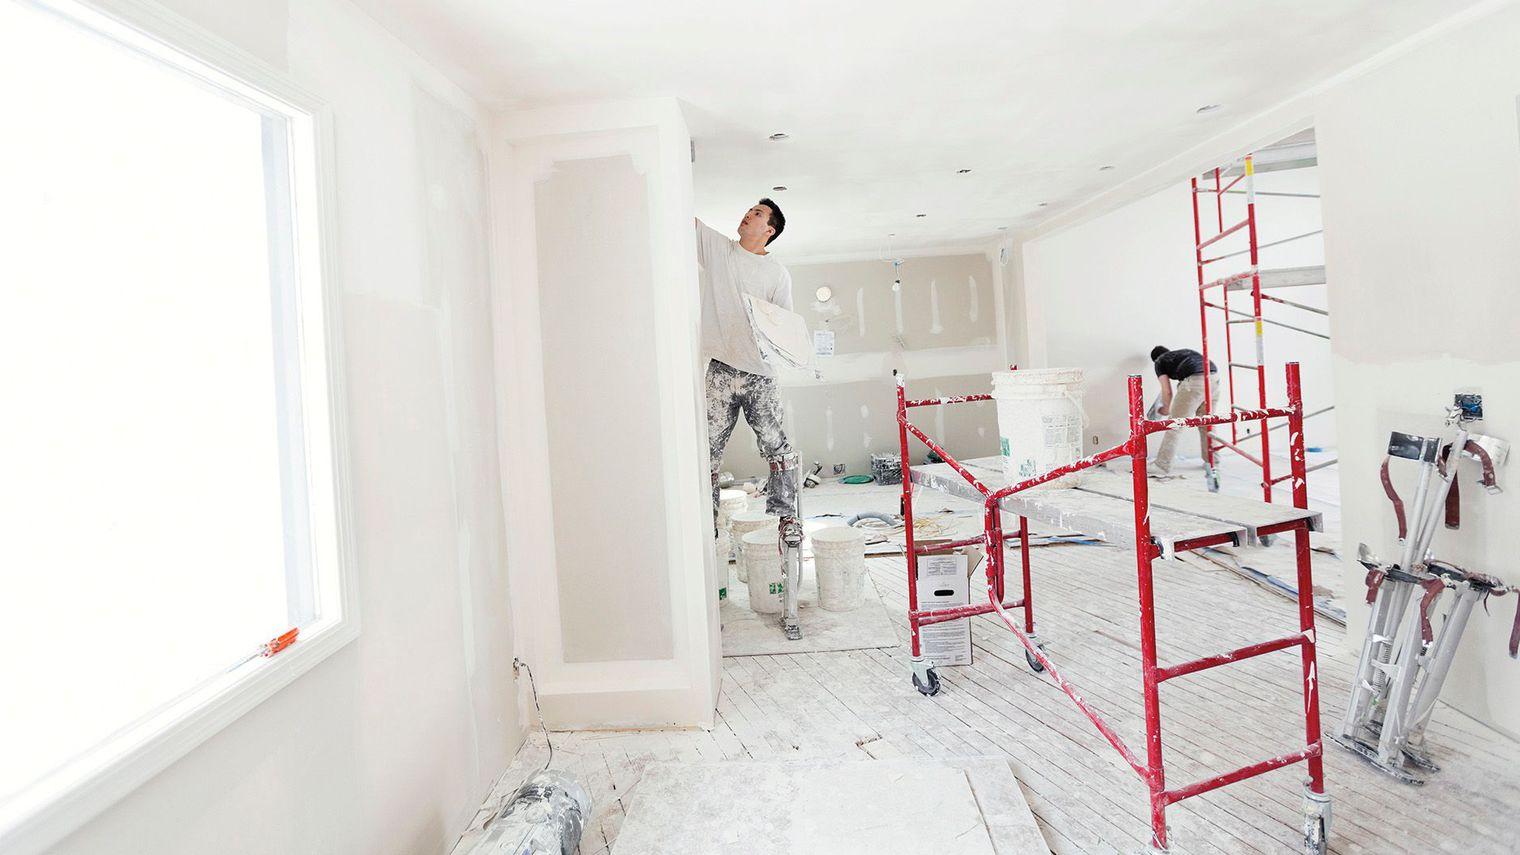 Faire construire sa maison les erreurs viter blog binche assurances binche immo for Budget construire sa maison